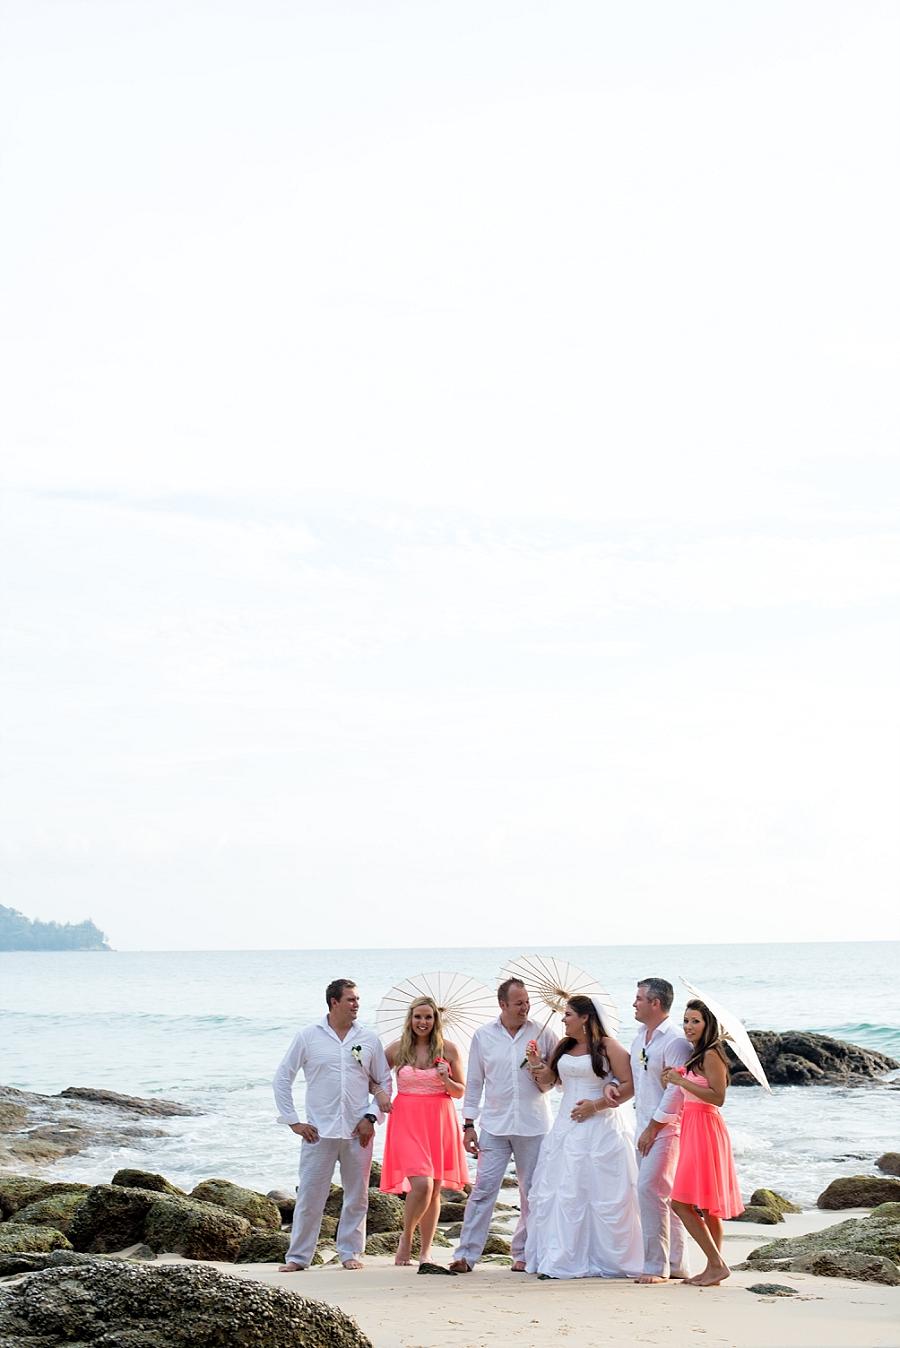 Darren Bester Photography - Cape Town Wedding Photographer - Destination Wedding - Thailand - Stacy and Shaun_0061.jpg